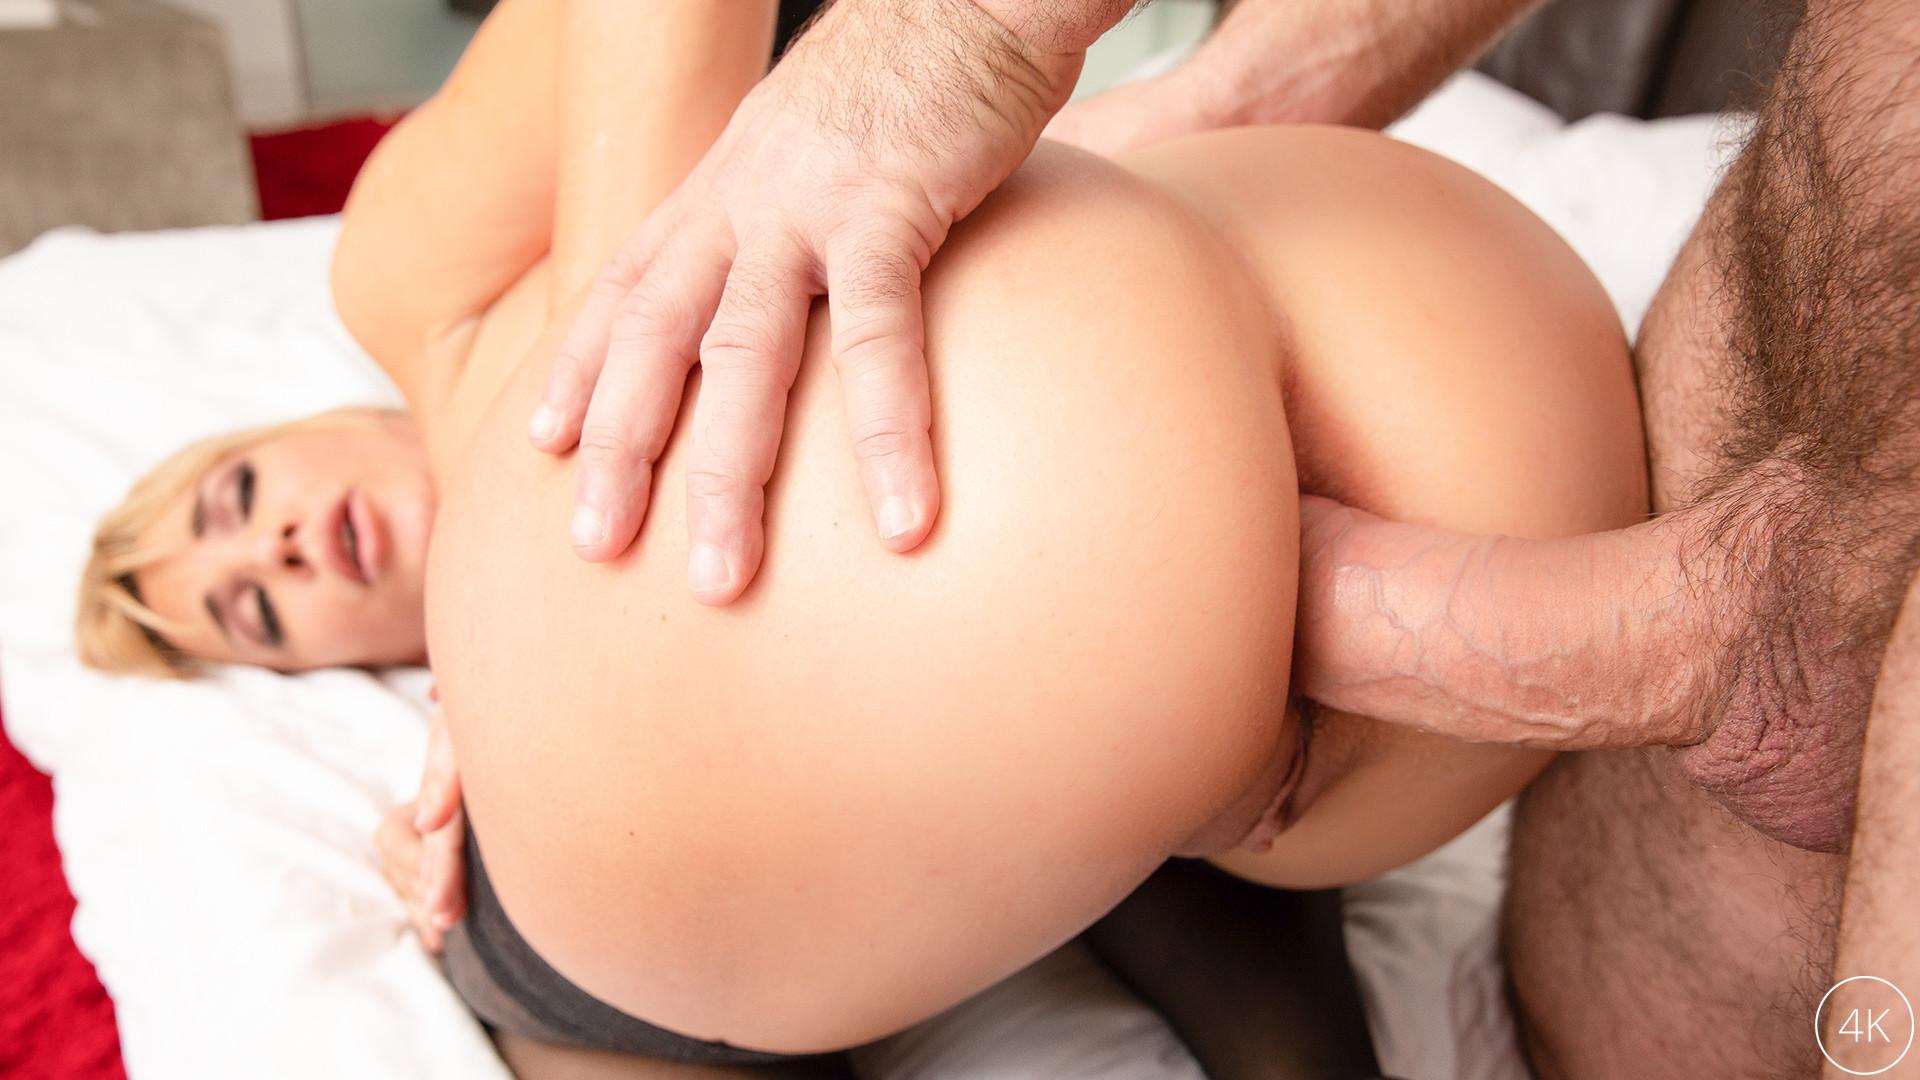 JulesJordan.com - Big Tit MILF Dana DeArmond Has Her Anal Cavity Explored